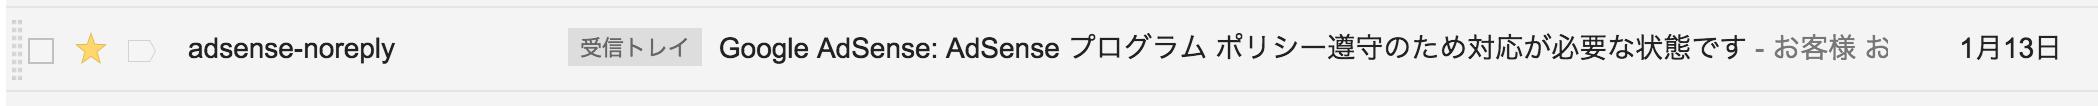 gmail google adsense